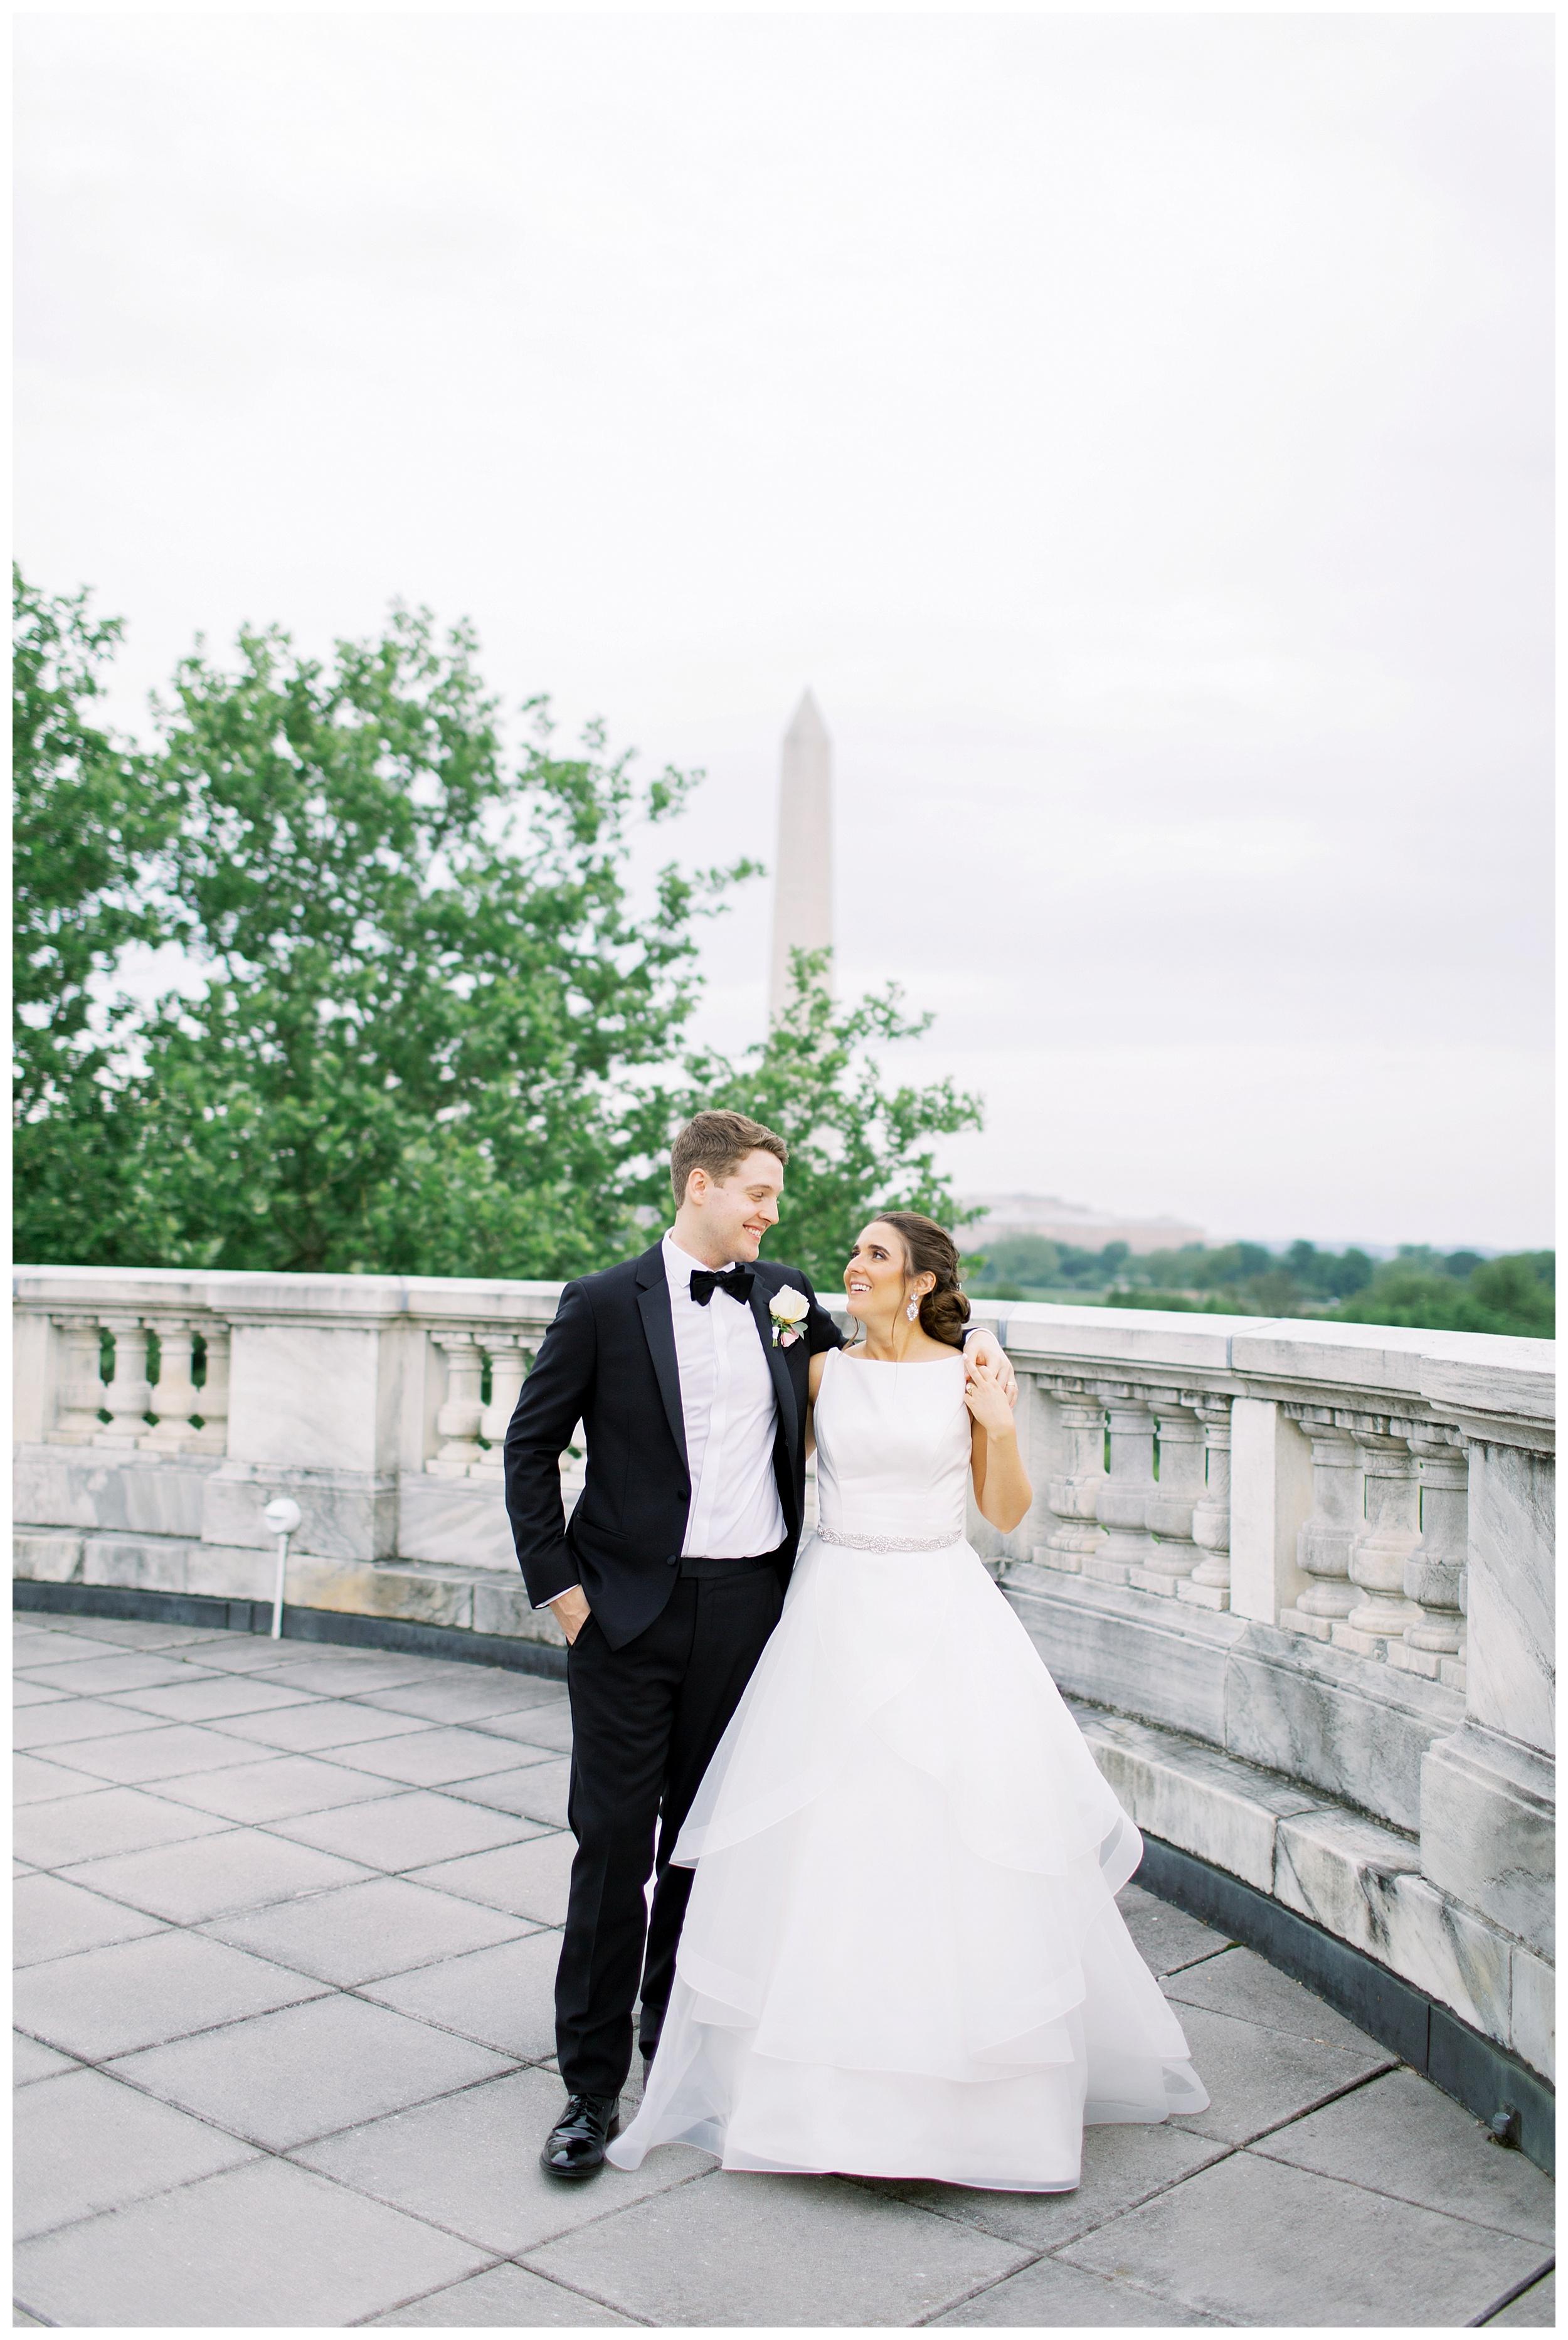 DAR Constitution Hall Wedding Wedding | Daughters of the American Revolution Wedding | District of Columbia Film Wedding Photographer Kir Tuben_0002.jpg